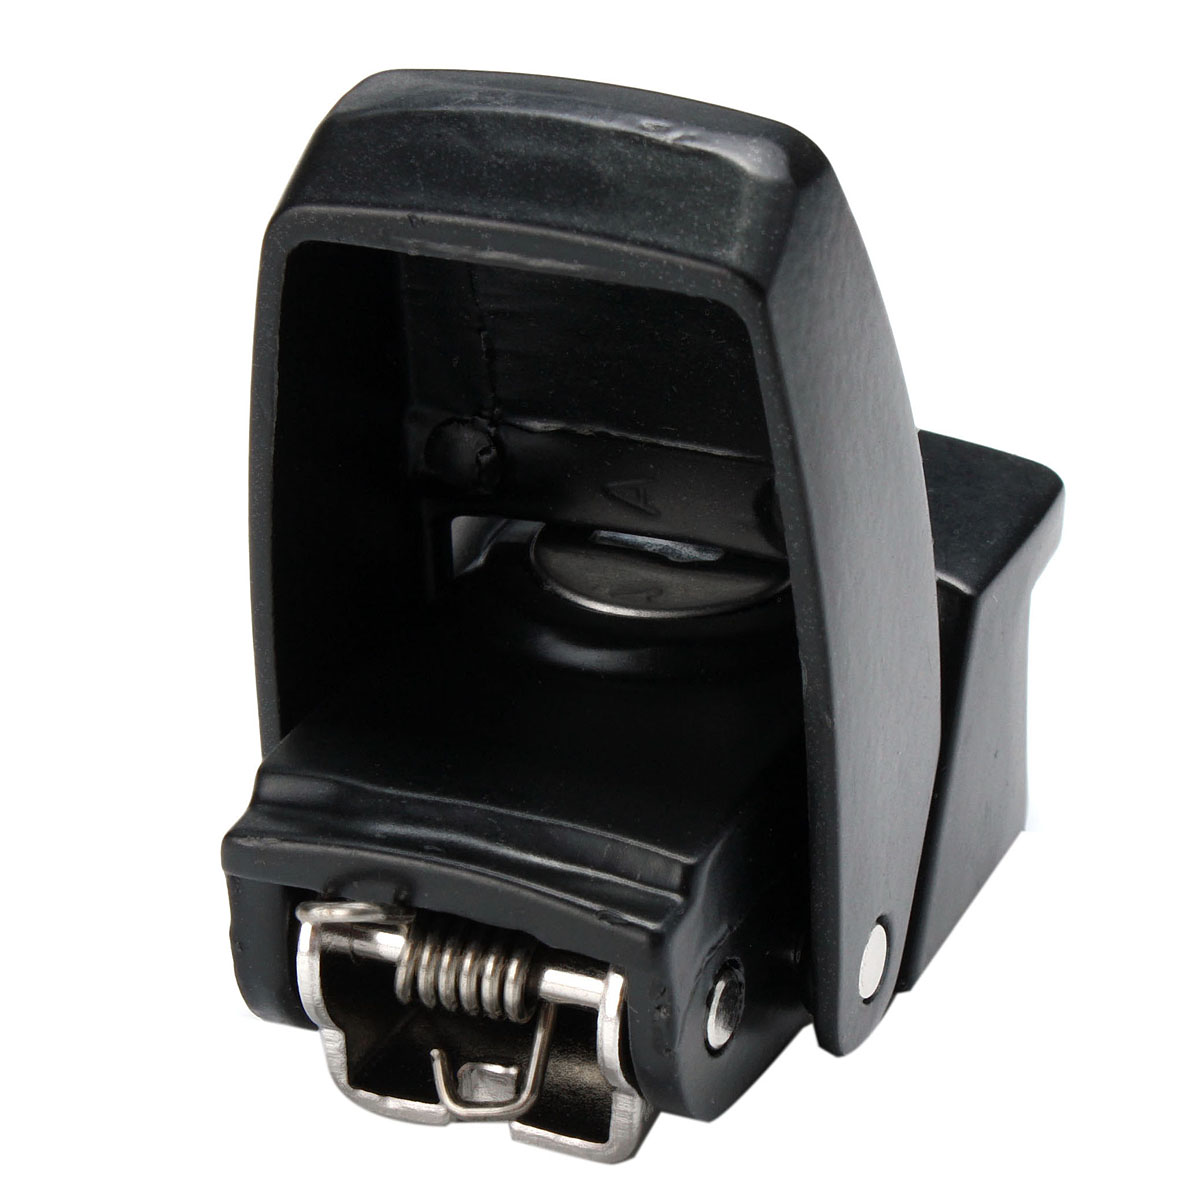 Black Cabinets Metal Bright Zinc Alloy Hasp Latch Drawer Lock Tool 2 Keys